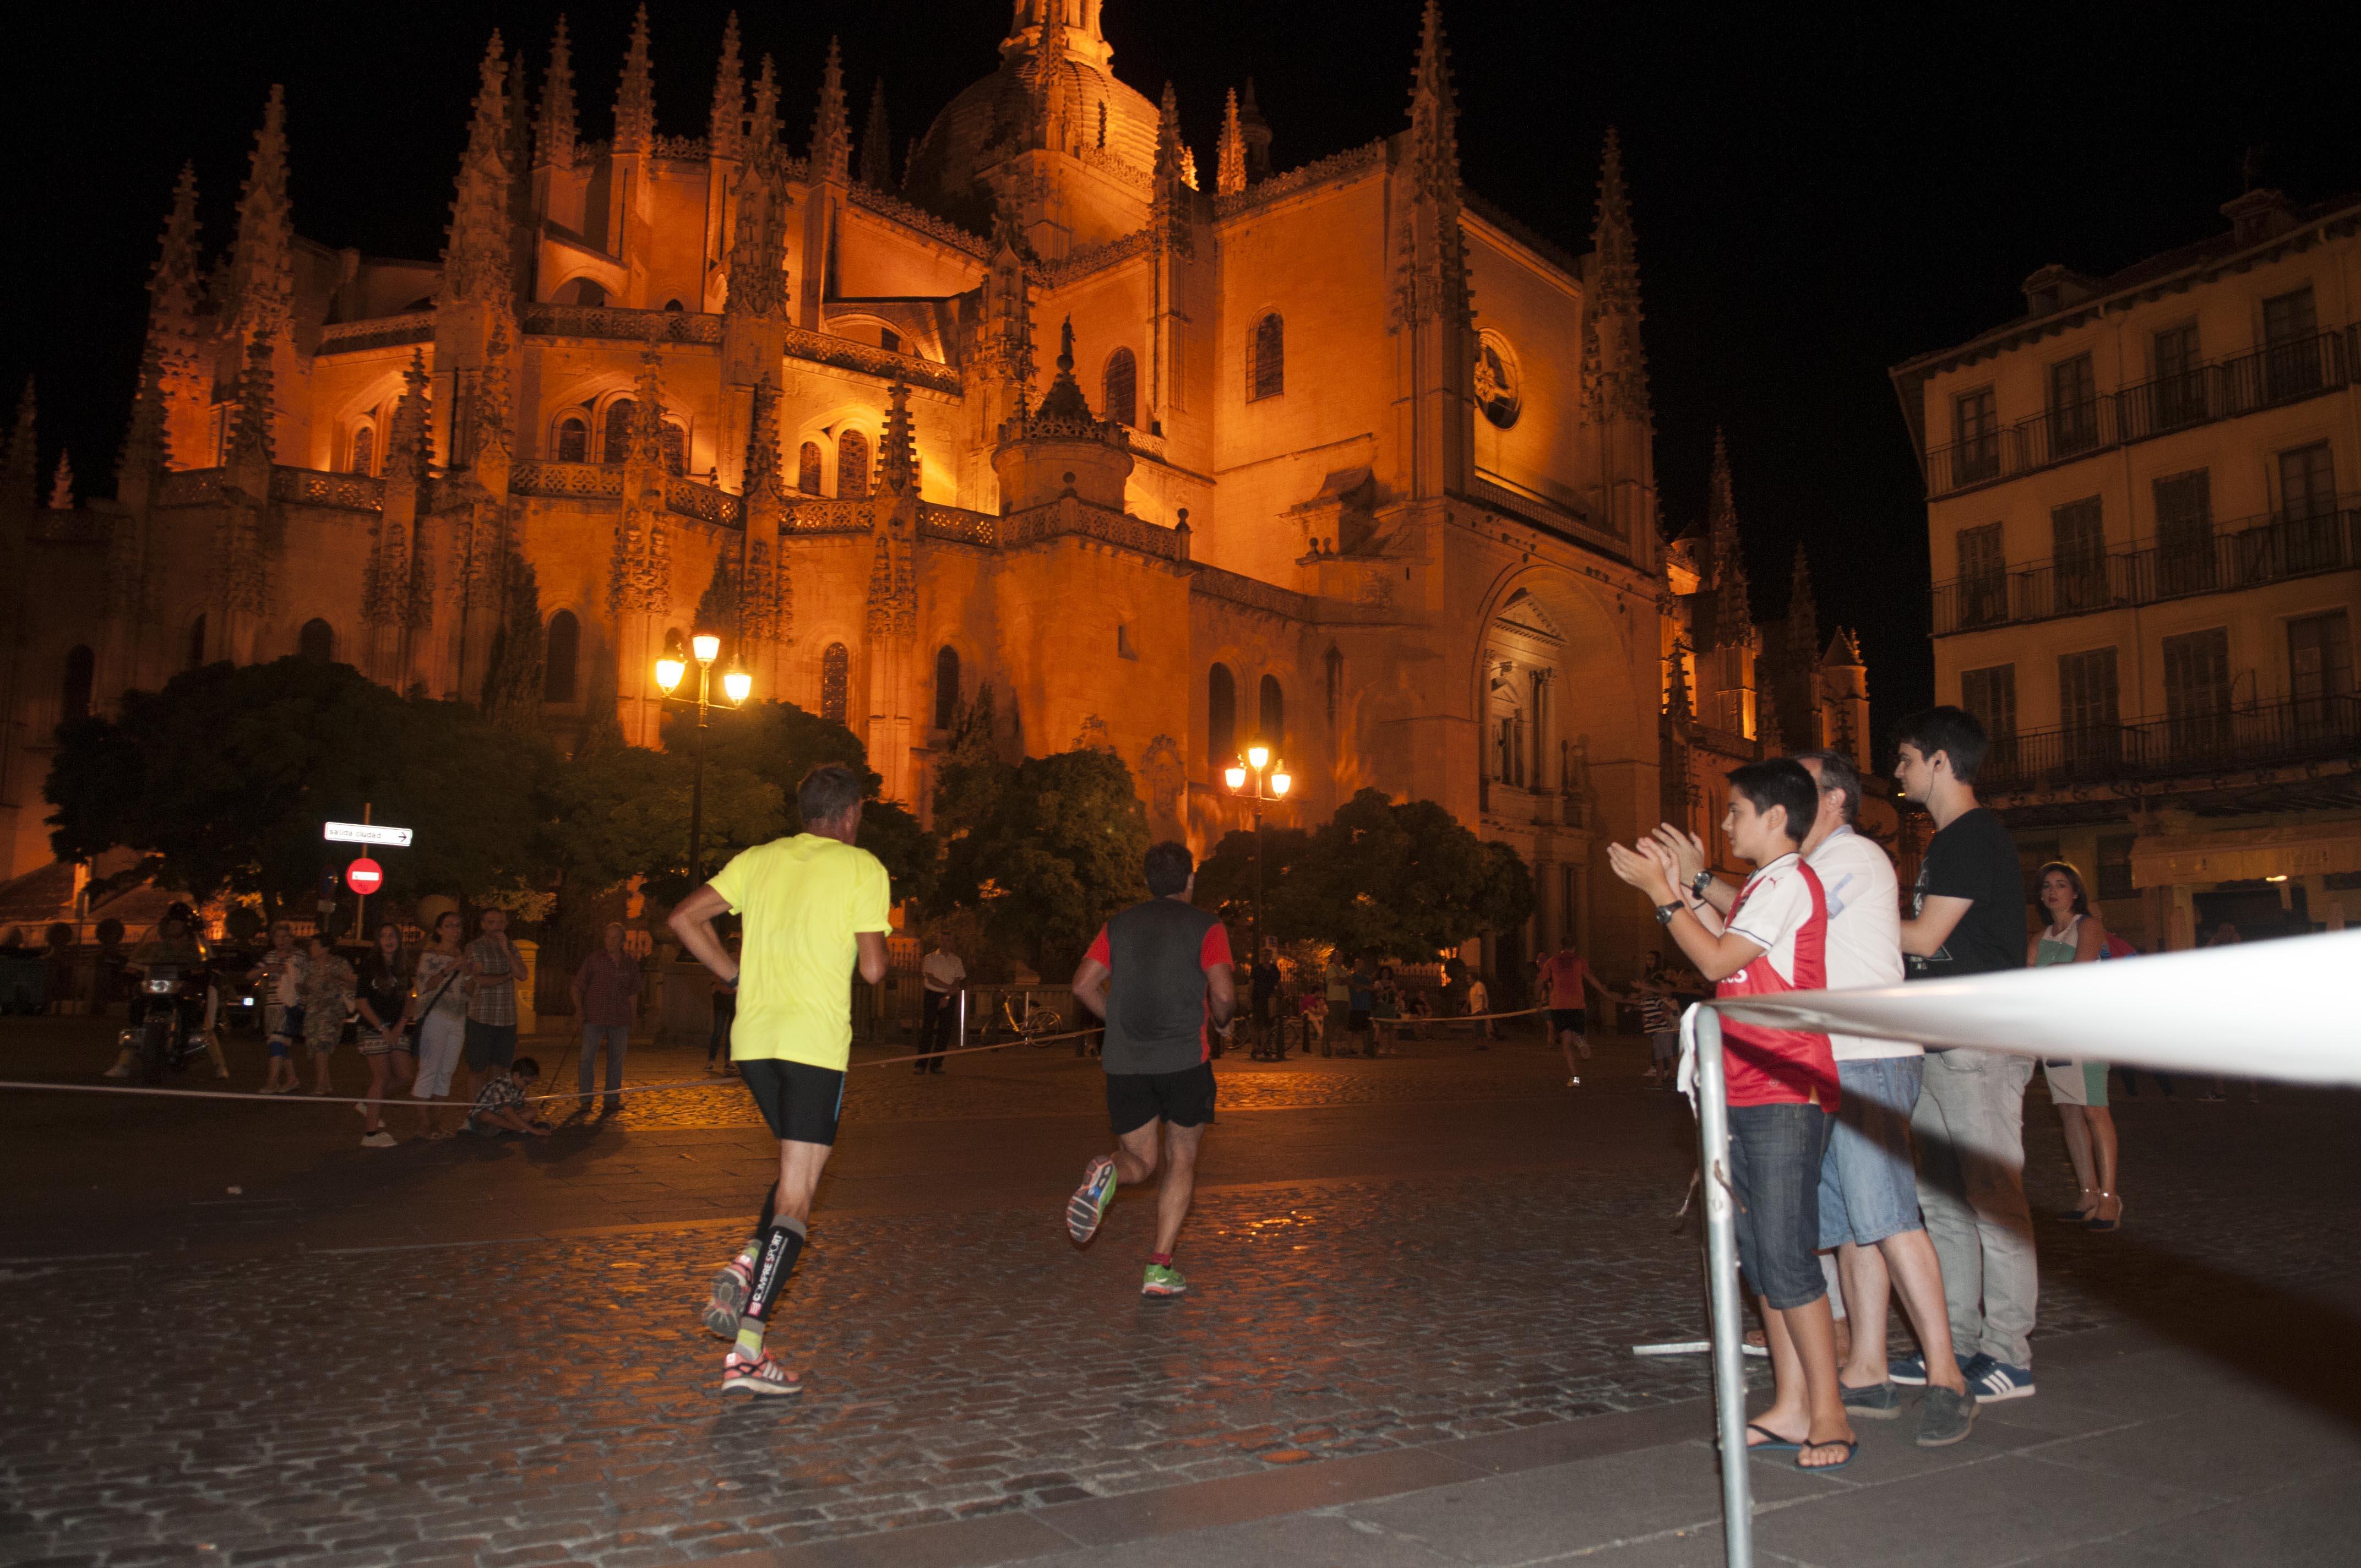 La Carrera Nocturna más espectacular regresa a Segovia en septiembre